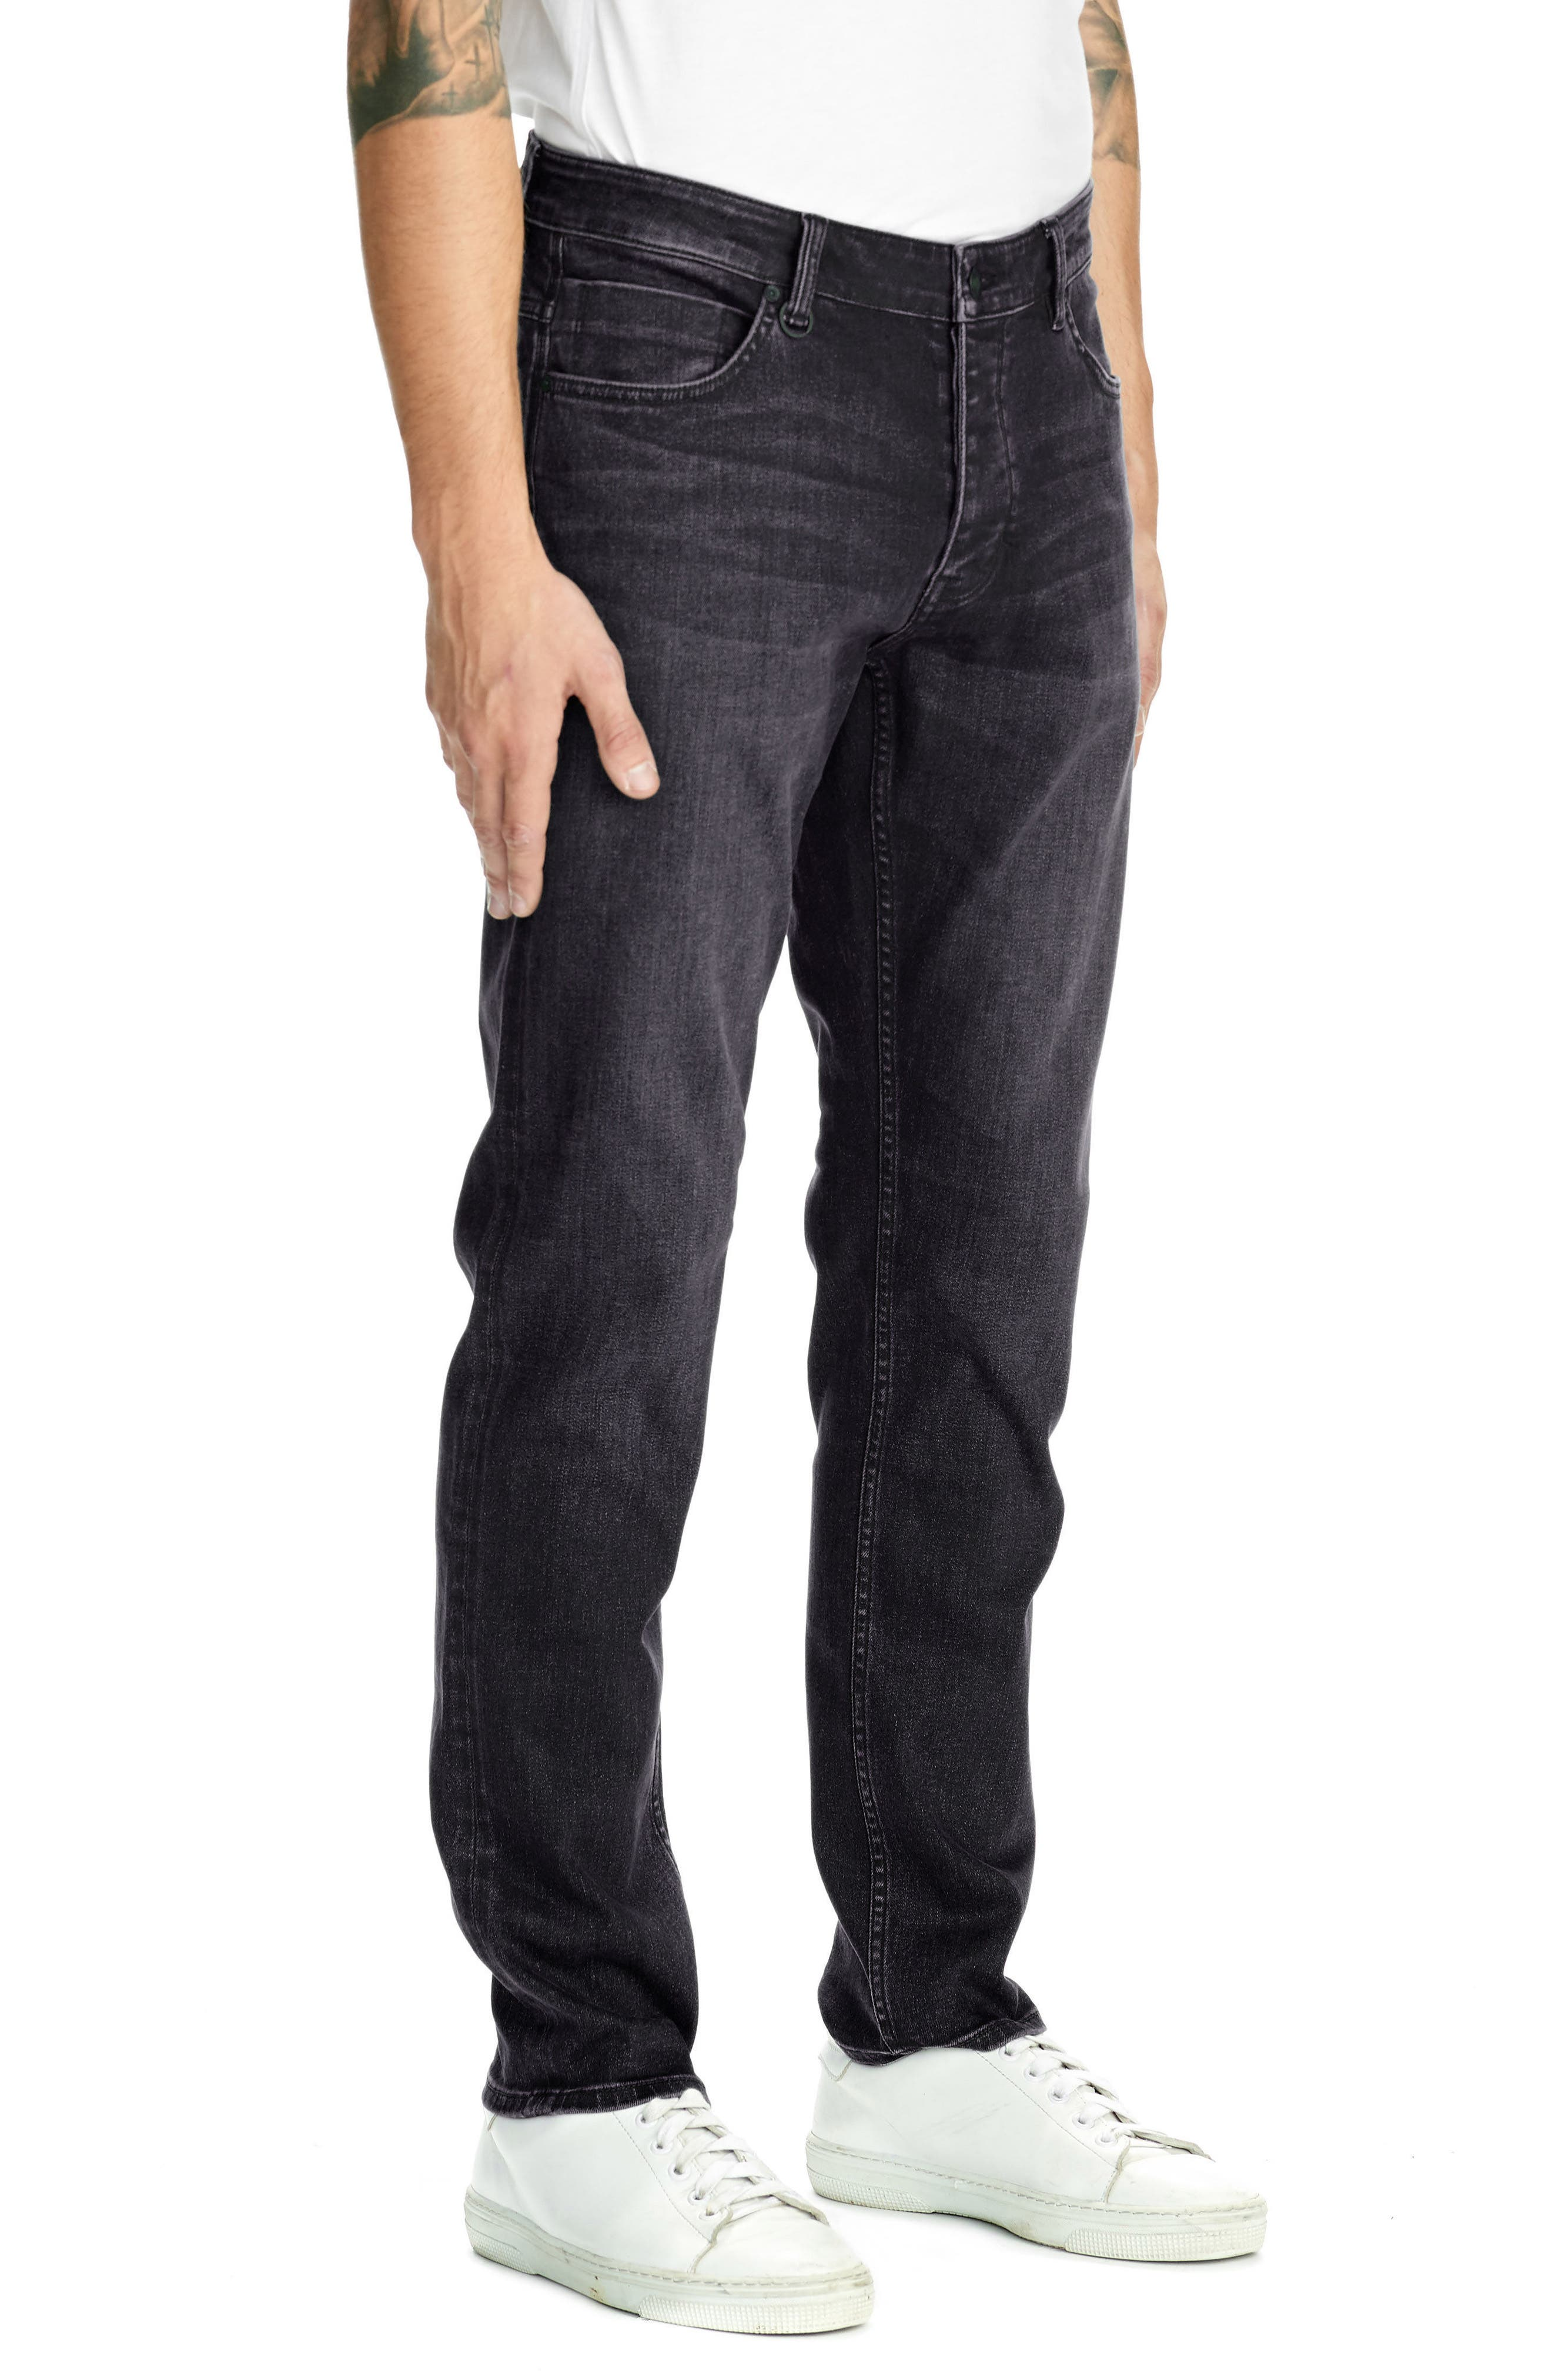 Lou Slim Fit Jeans,                             Alternate thumbnail 3, color,                             Sthlm Modern